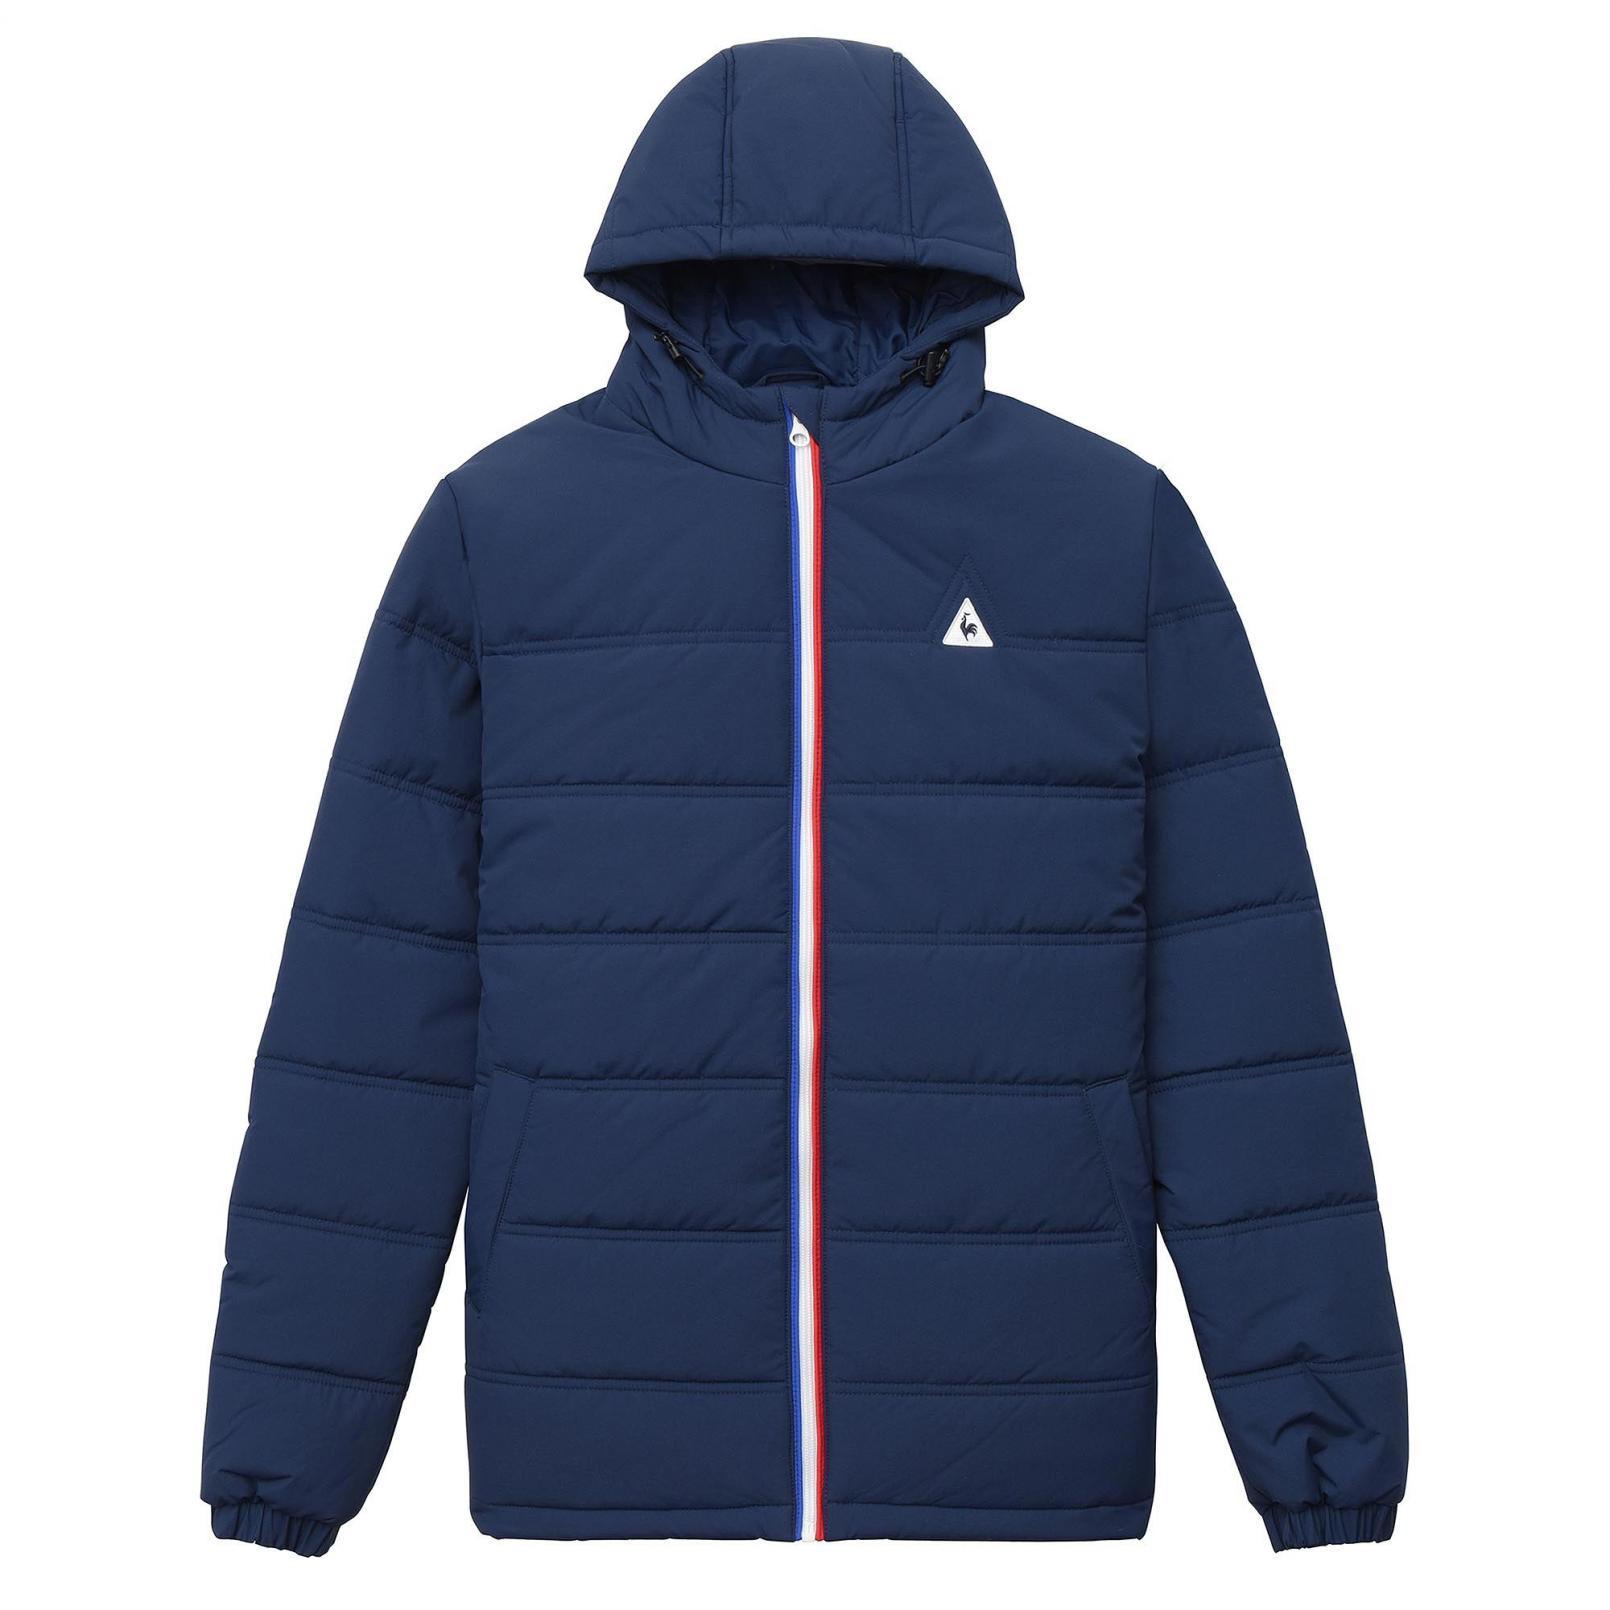 Coats & Jackets – Le Coq Sportif Essentiels Jacket Blue